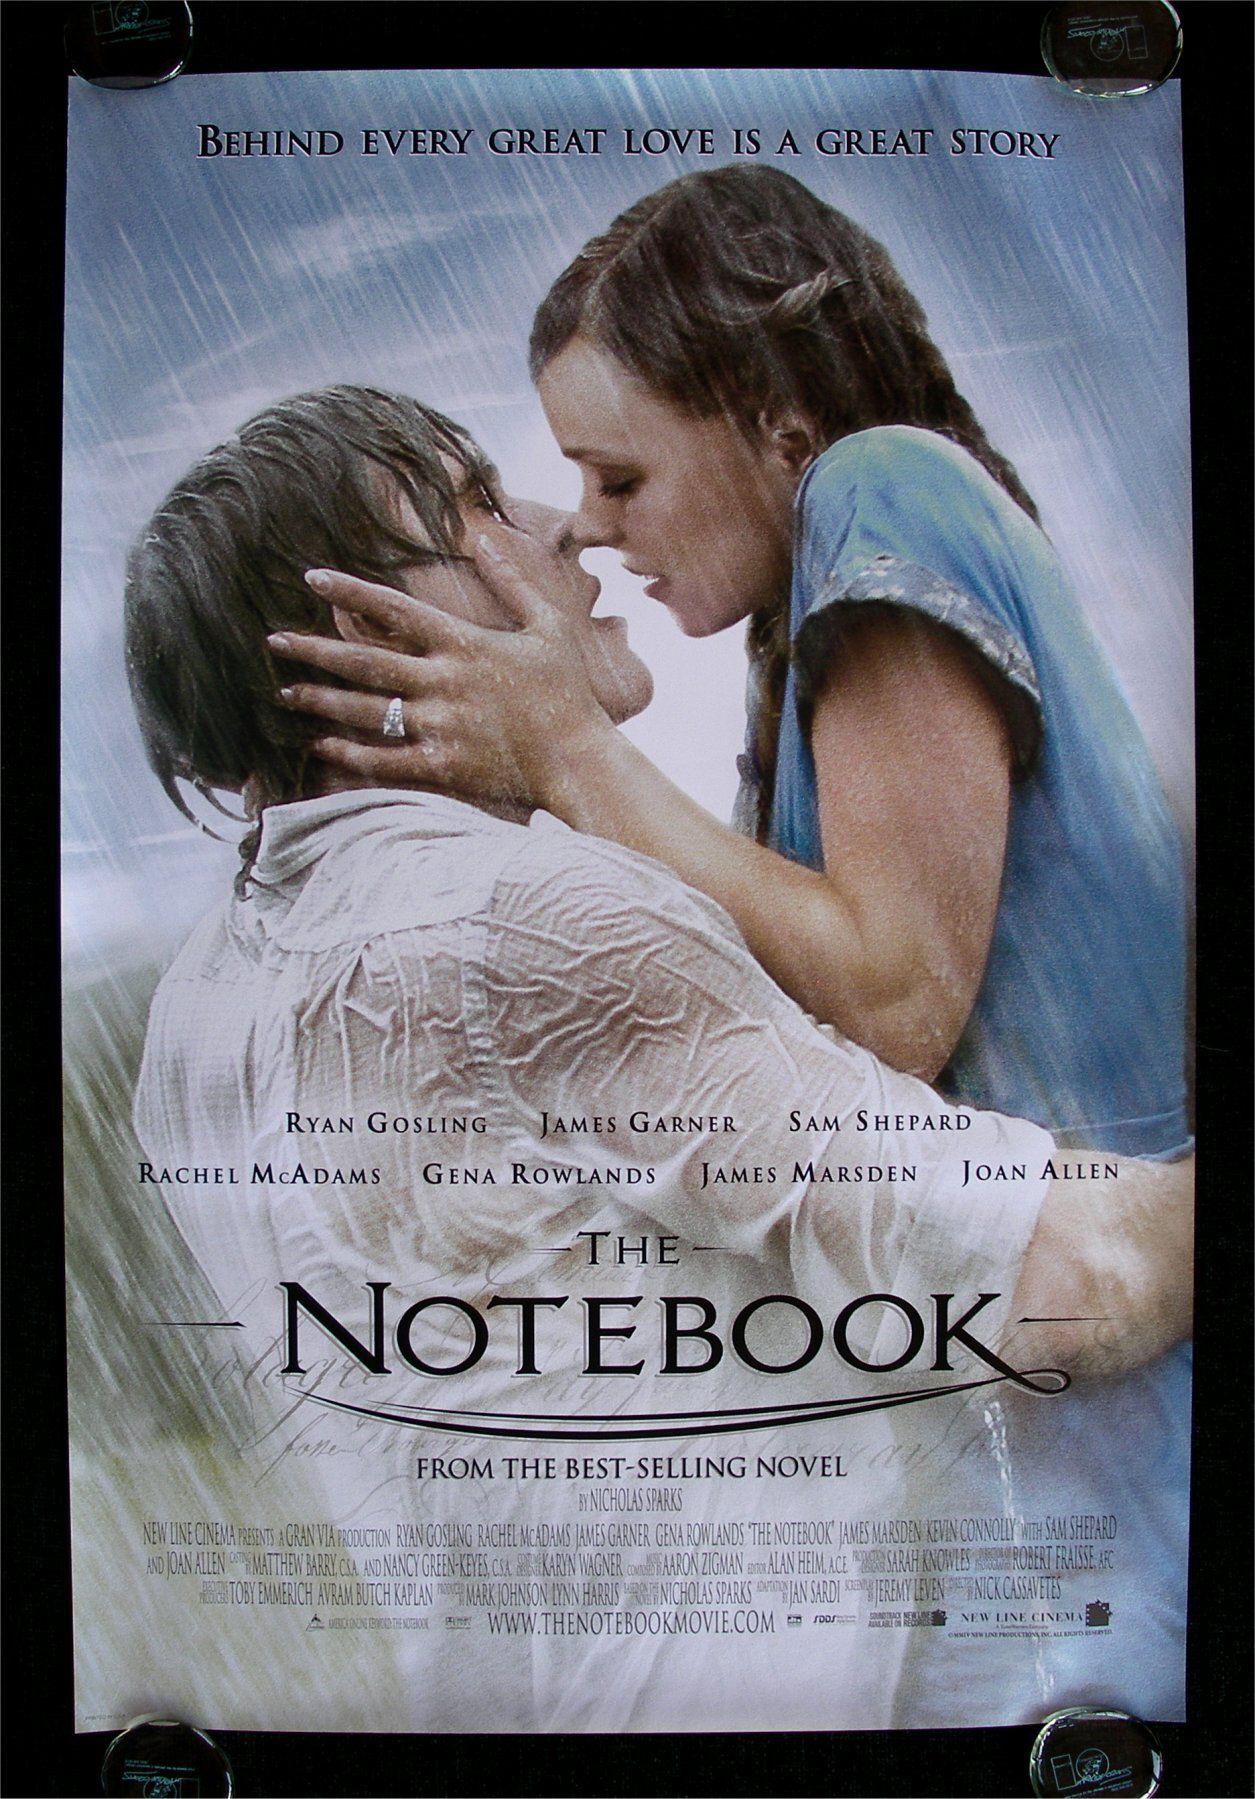 Gifford Gies Notebook Film Still